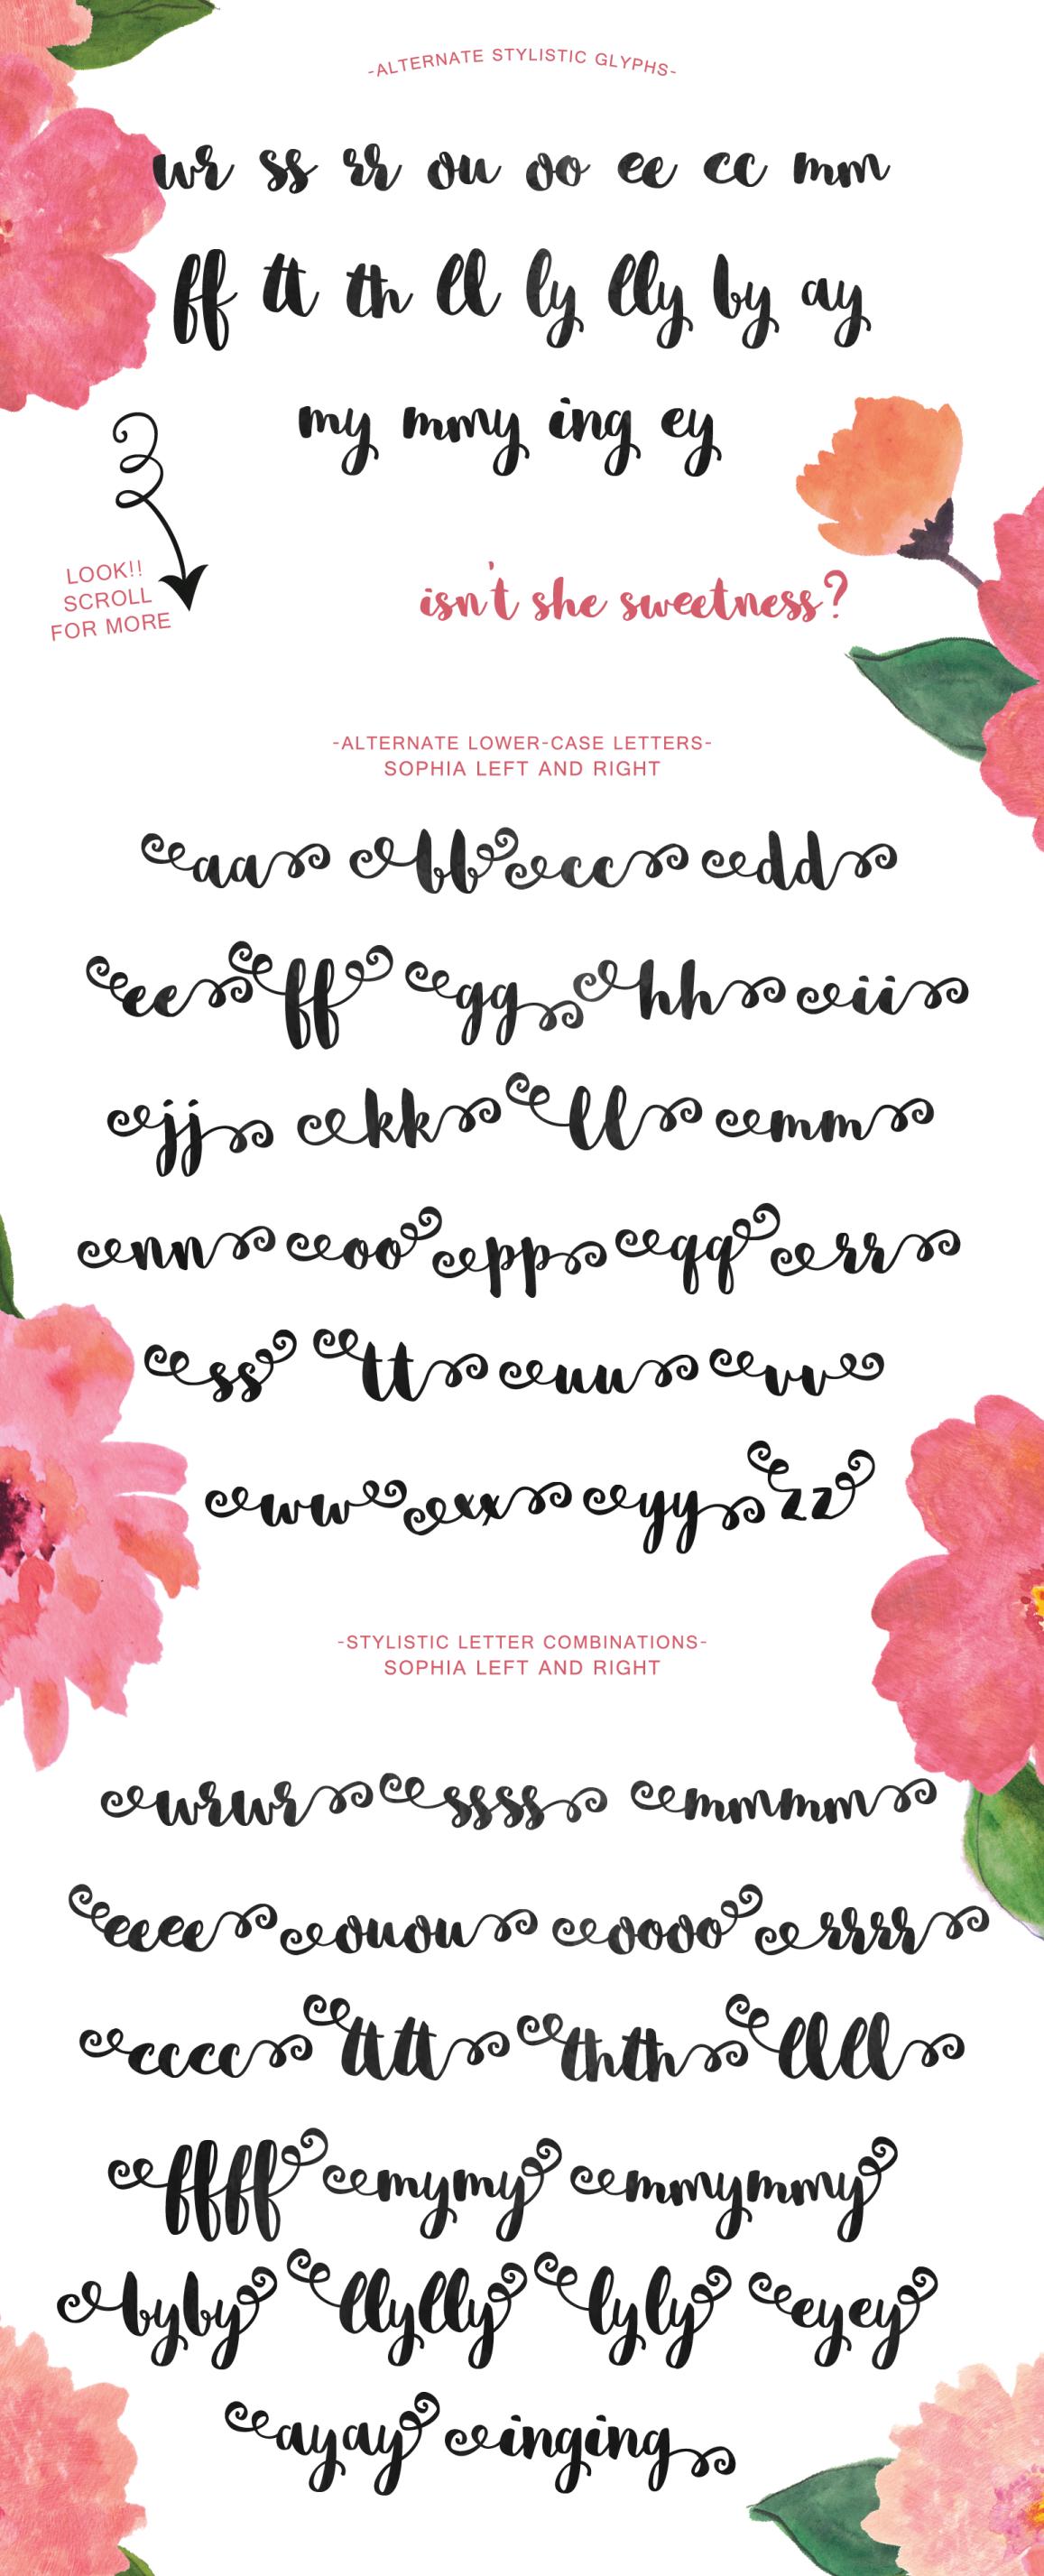 Sophia – Free Hand Lettered Script Font Poster C